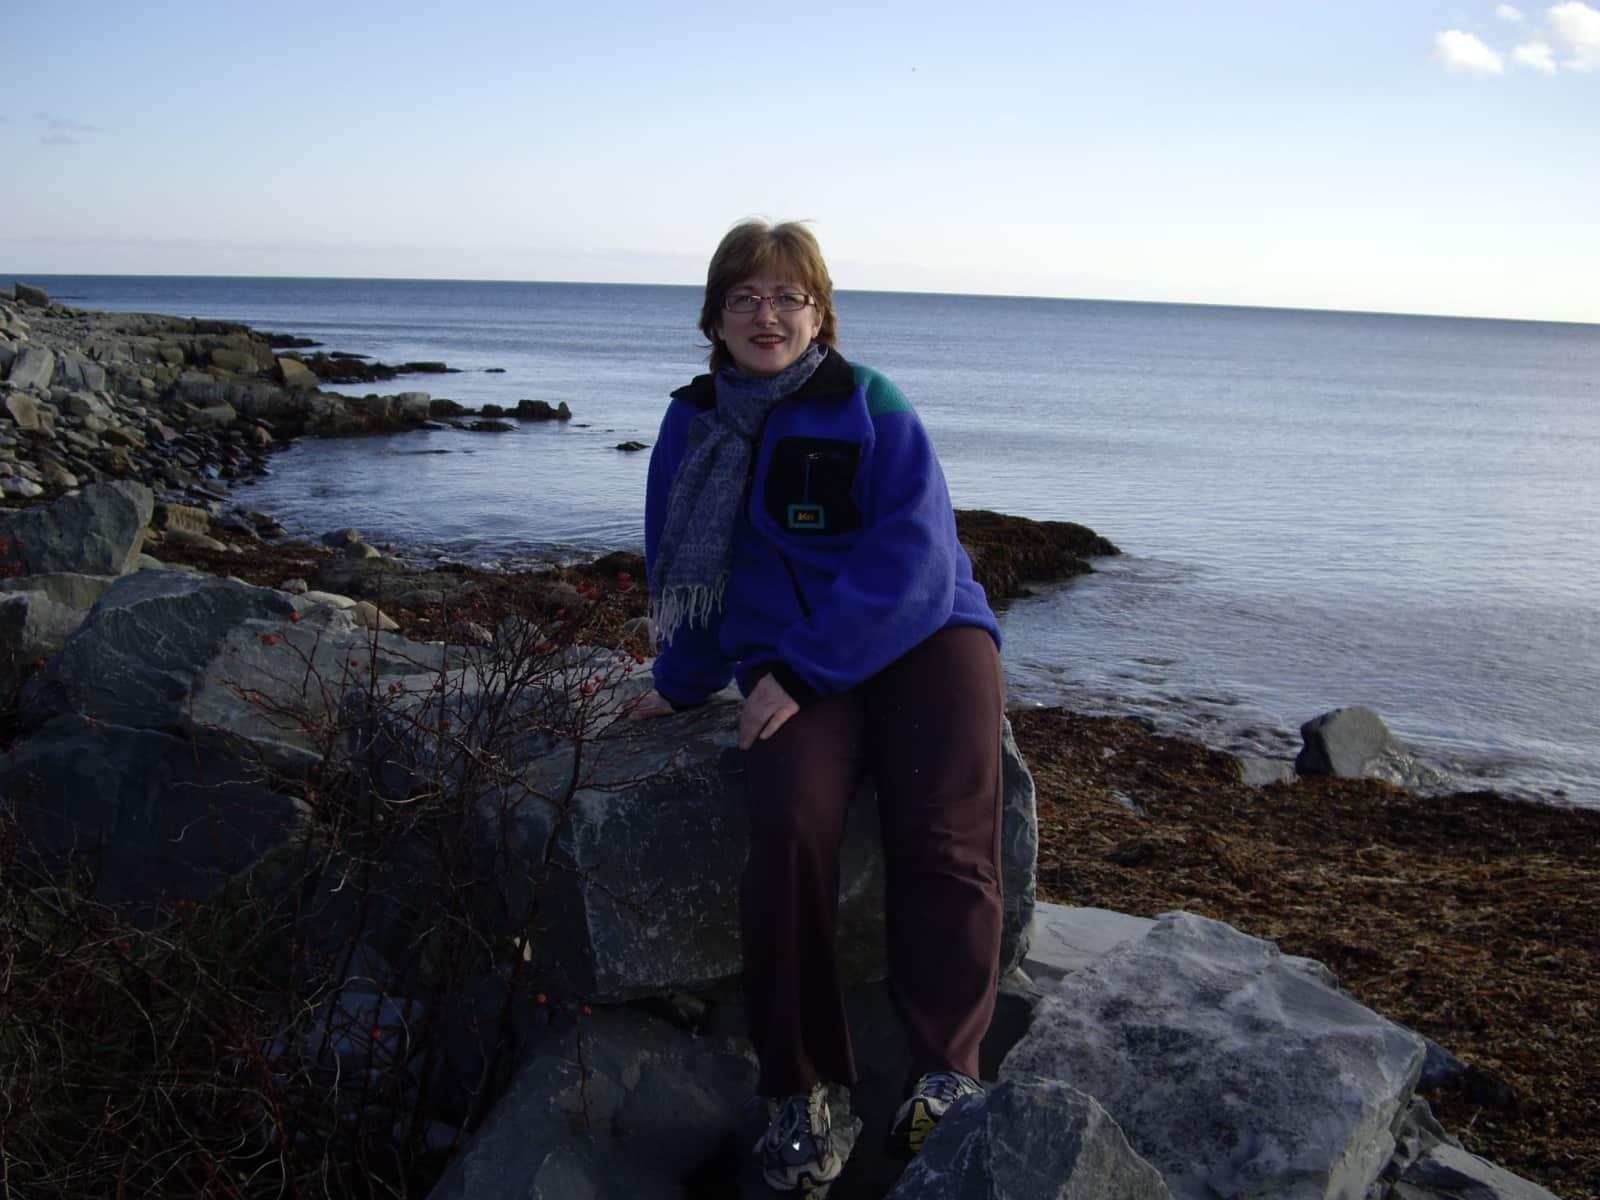 Lyann from Halifax, Nova Scotia, Canada